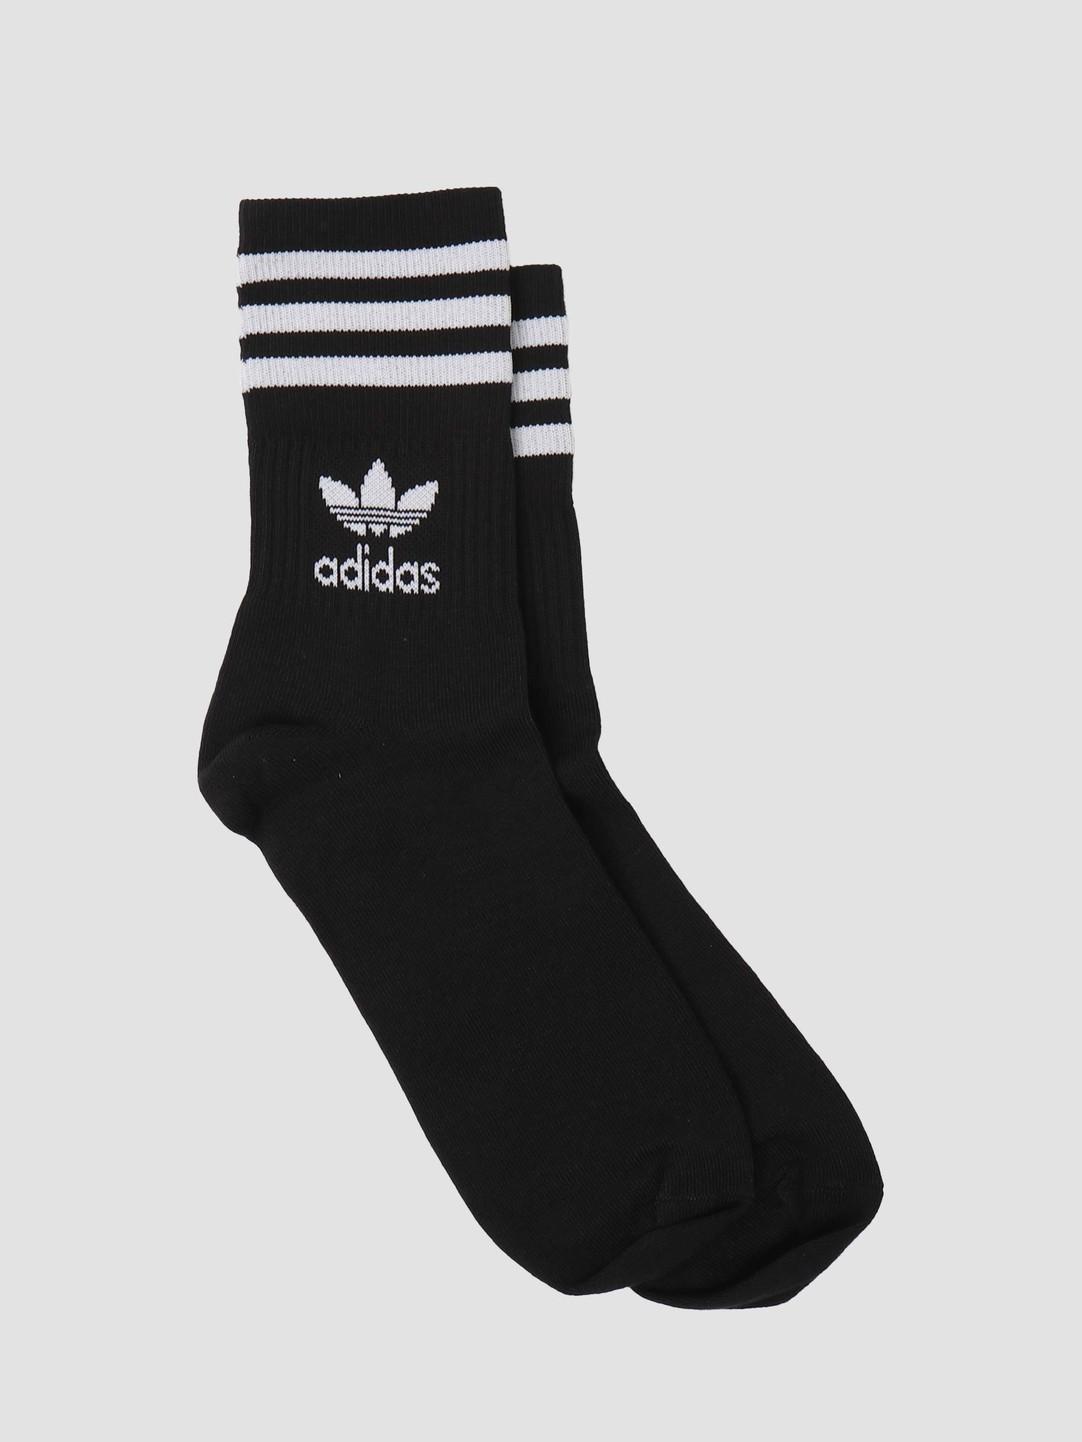 adidas adidas Mid Cut Crew Sock Black White GD3576